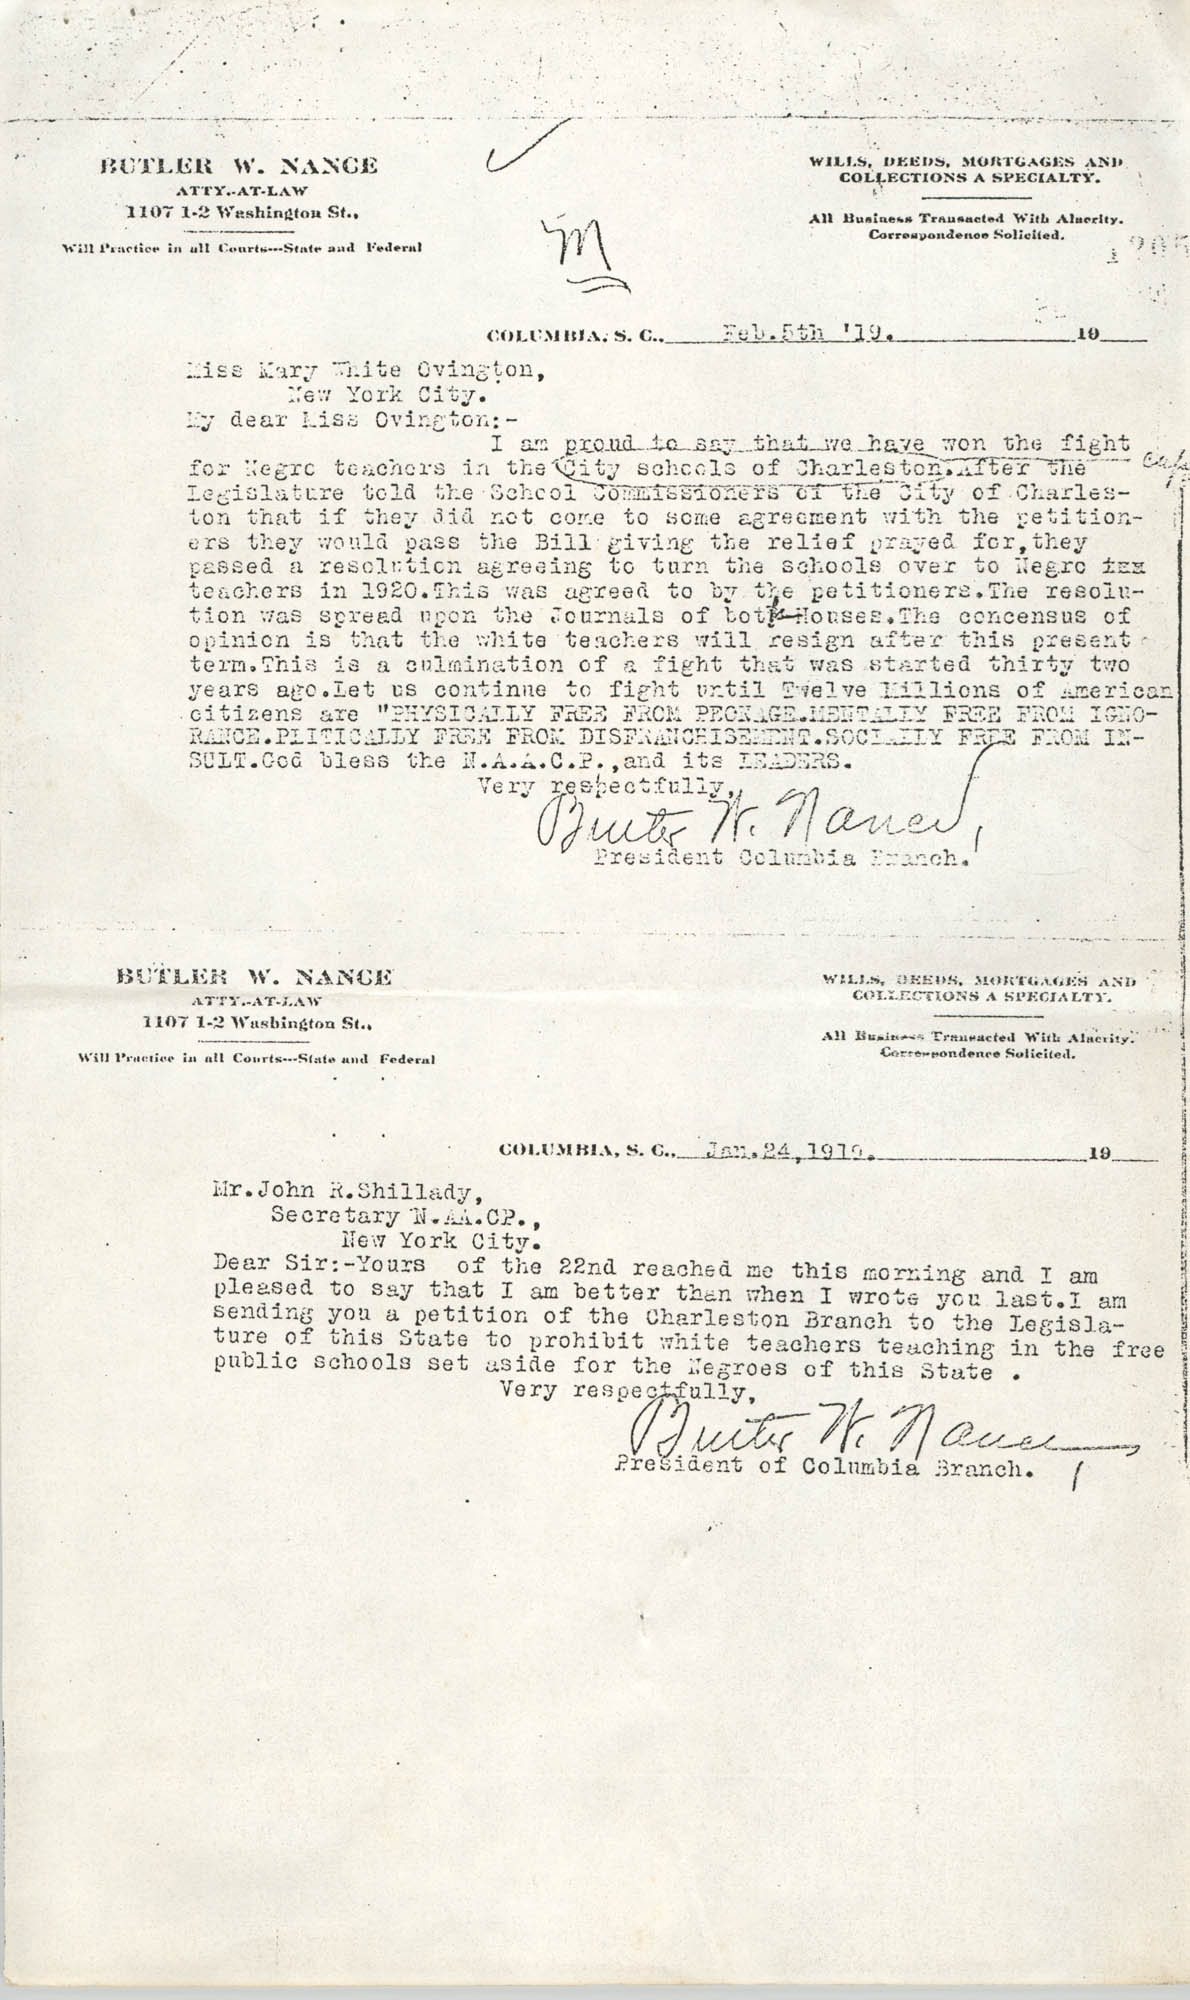 Butler W. Nance Correspondence, 1919